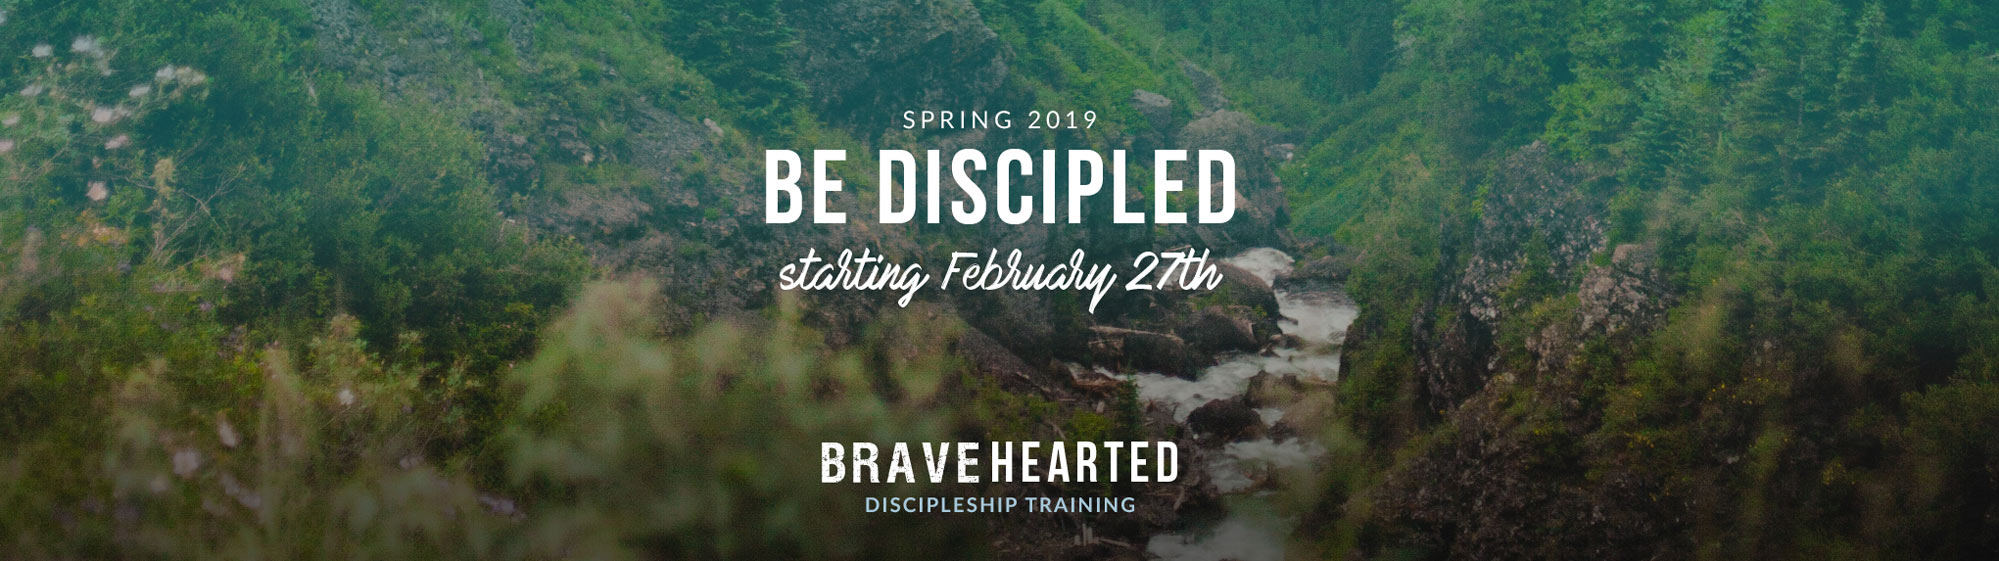 Bravehearted Discipleship Training